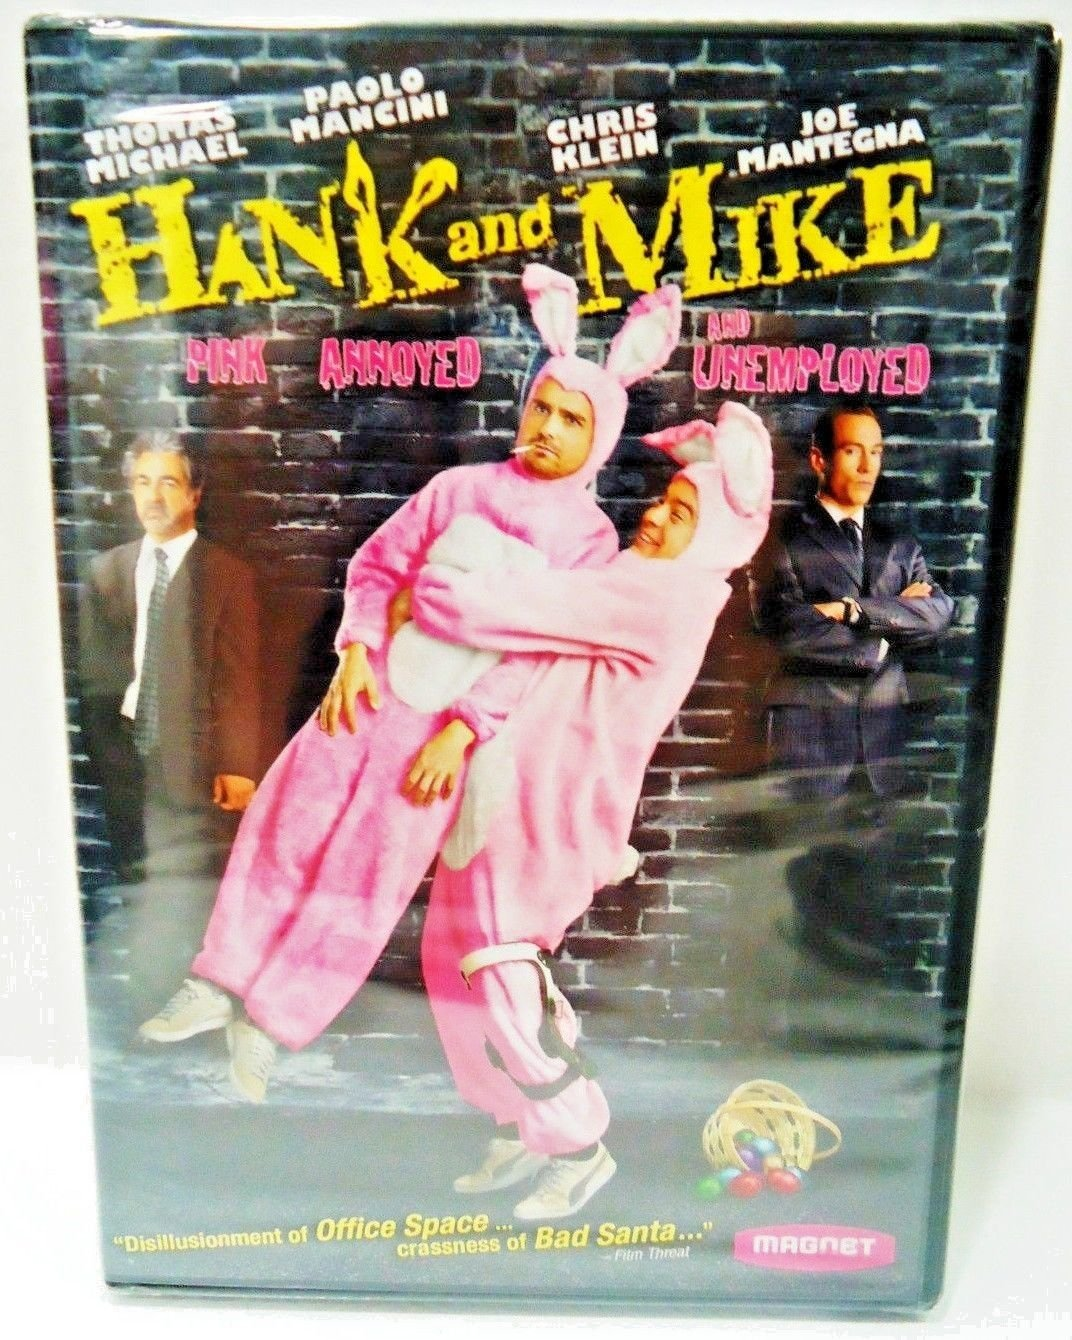 HANK & MIKE - DVD - JOE MANTEGNA - CHRIS KLEIN - NEW - SEALED - COMEDY - MOVIE